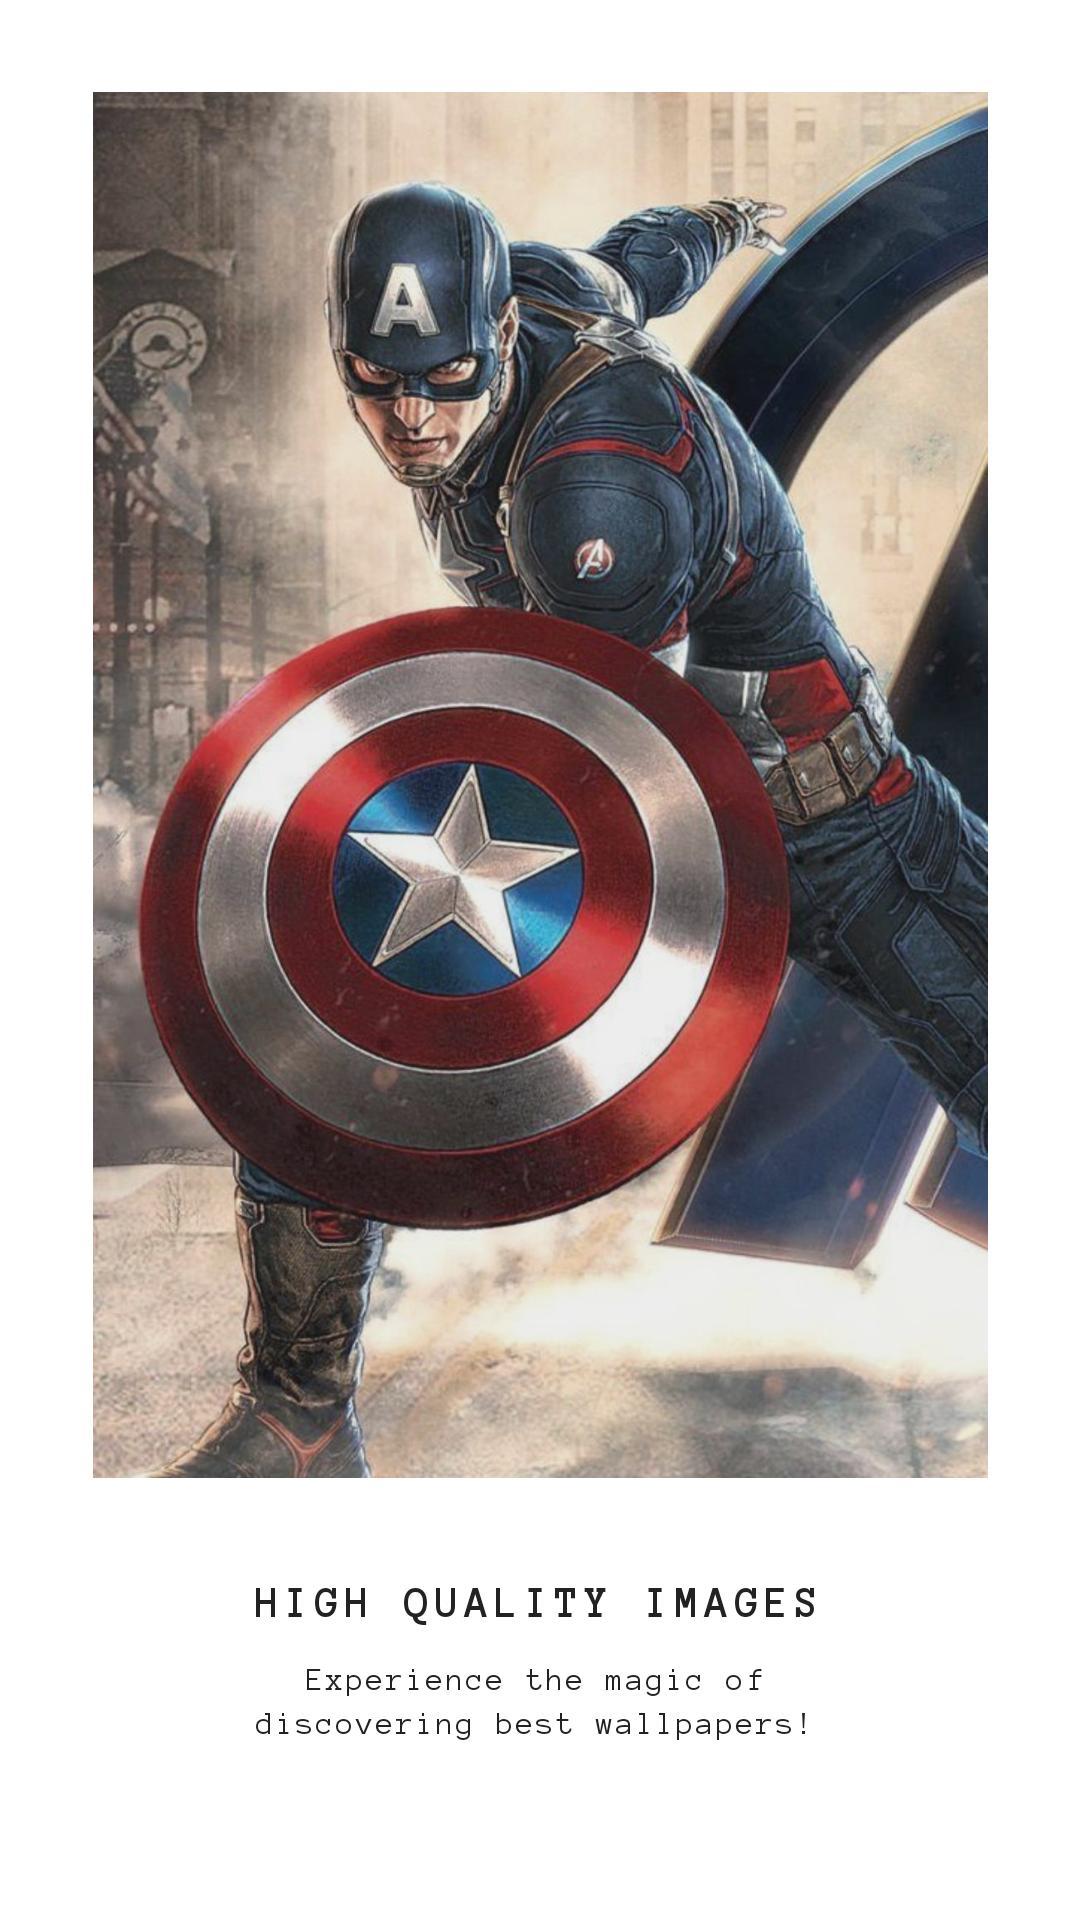 Captain America Marvel Comics Hd 4k Wallpapers For